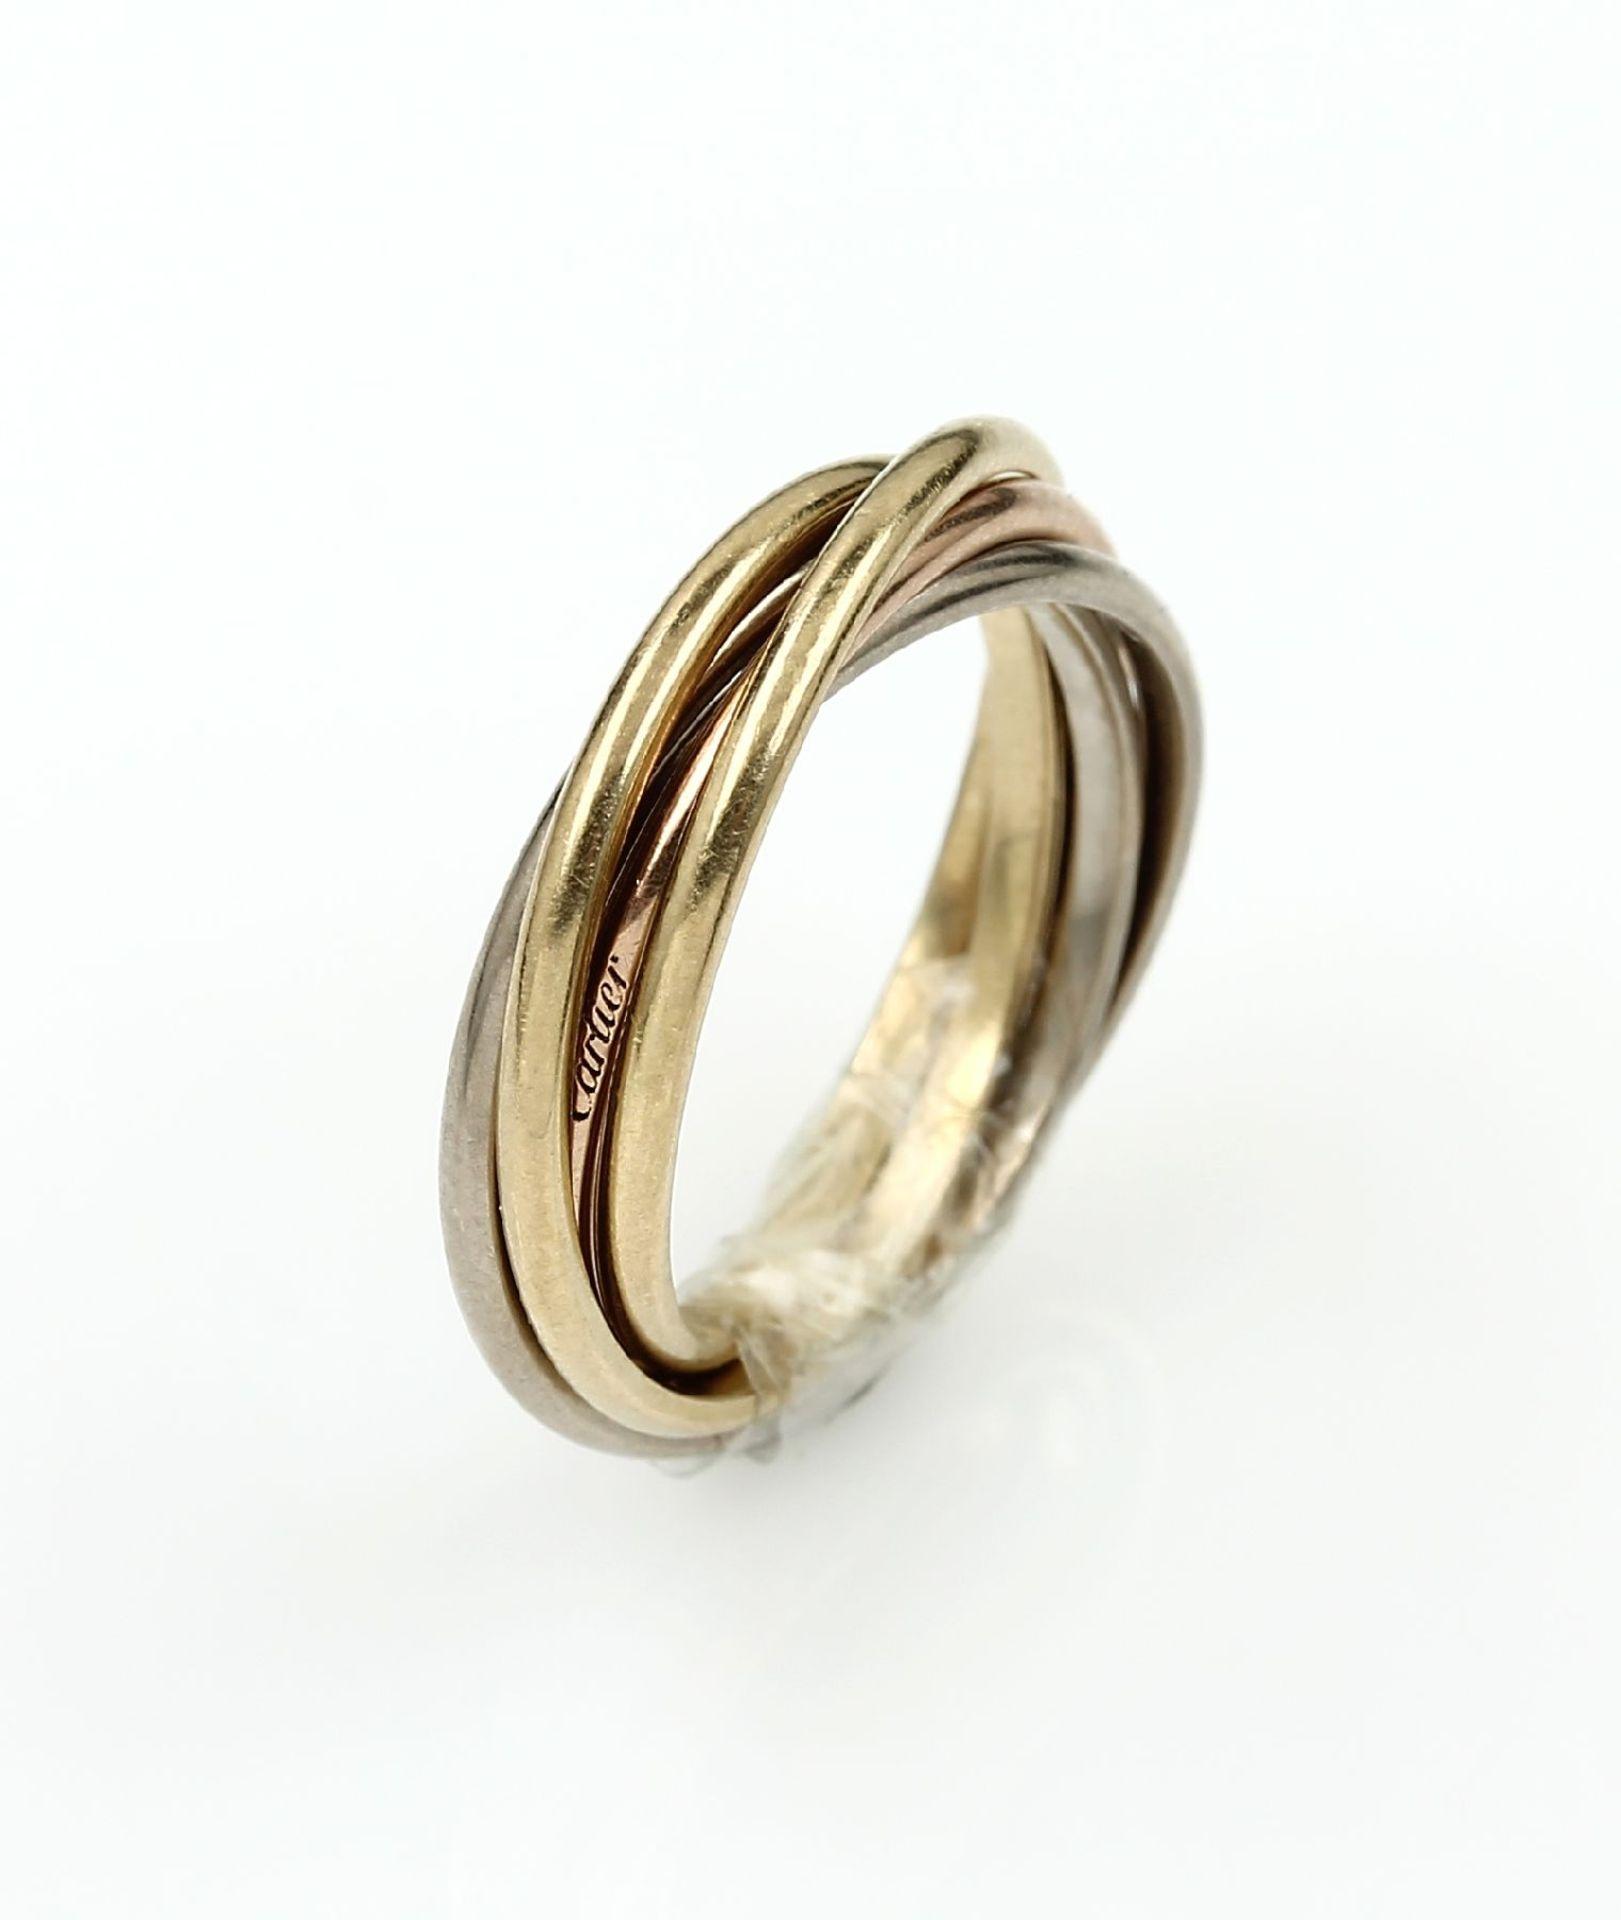 18 kt Gold CARTIER Trinity 5 Band Ring, GG/WG/RG 750/000, sign. und num., RW 5018 kt gold CARTIER